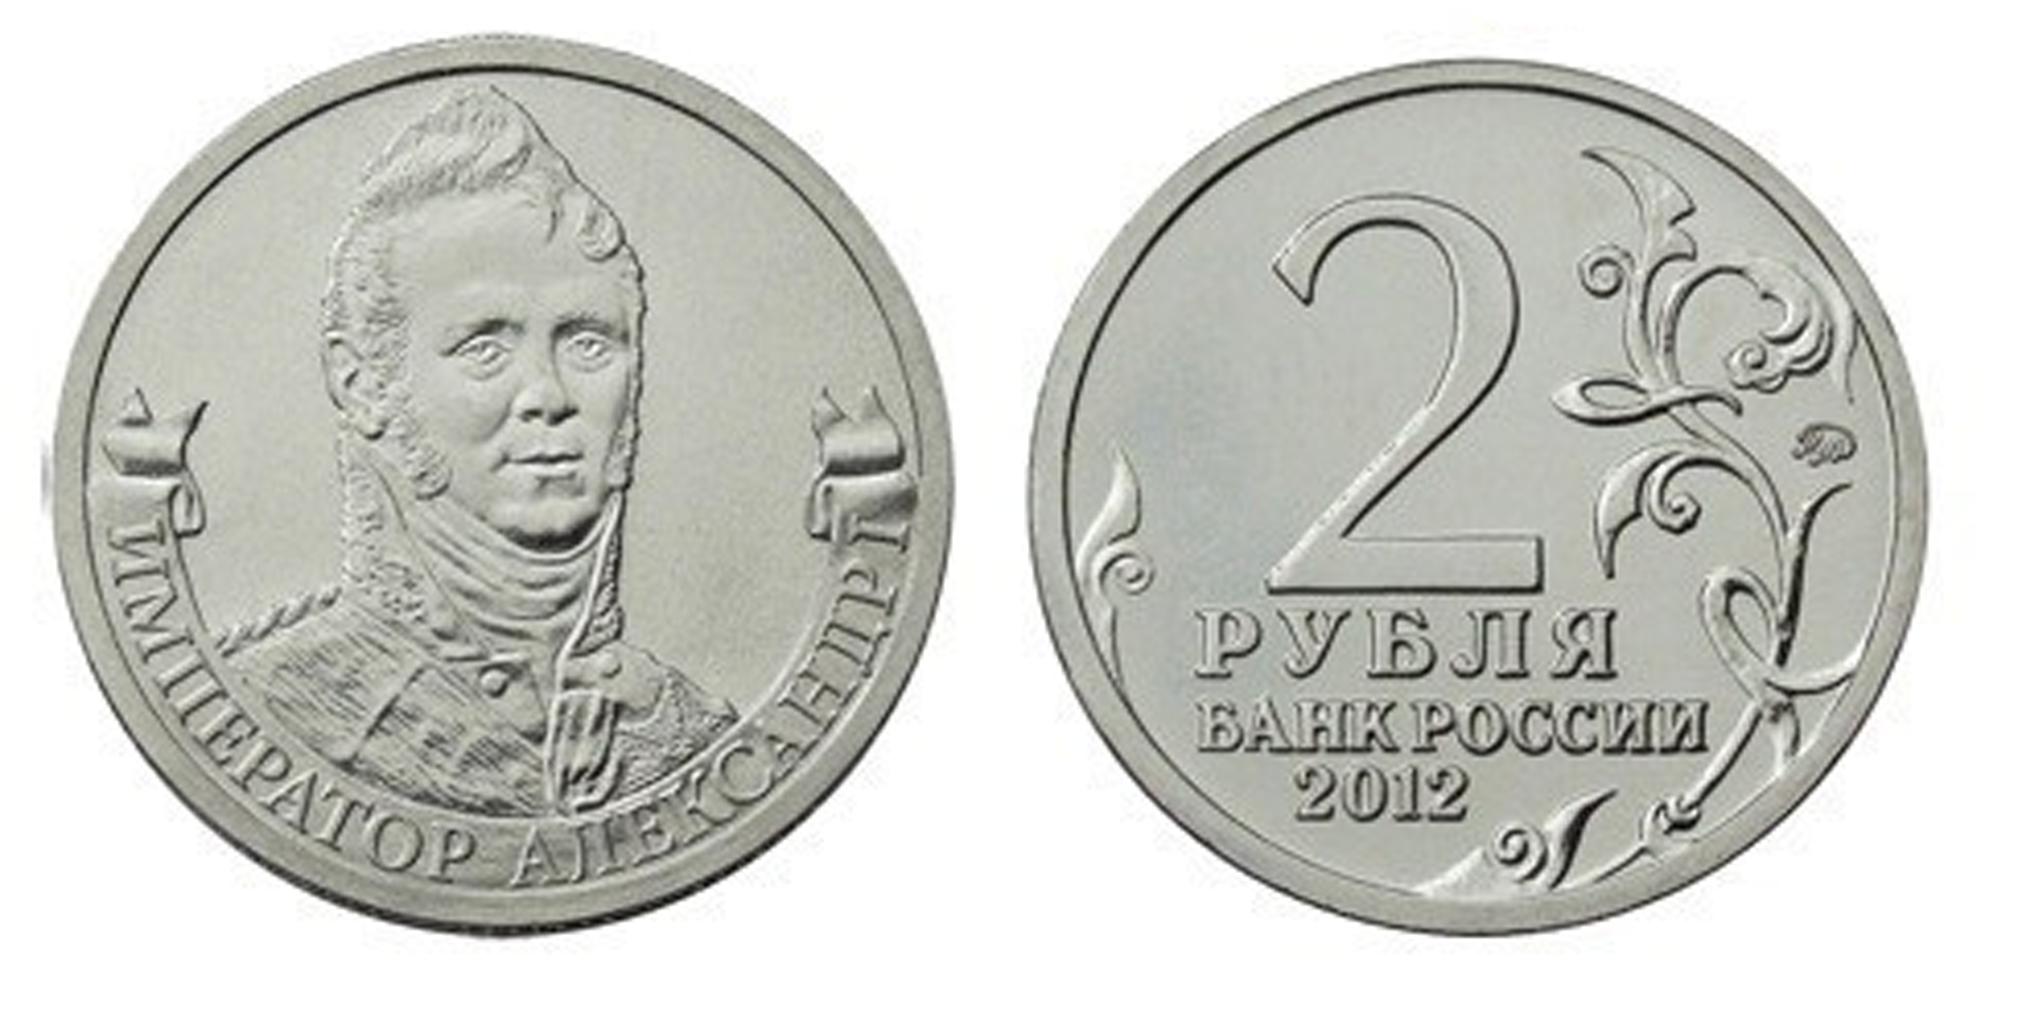 2 рубля Император Александр I 2012 год